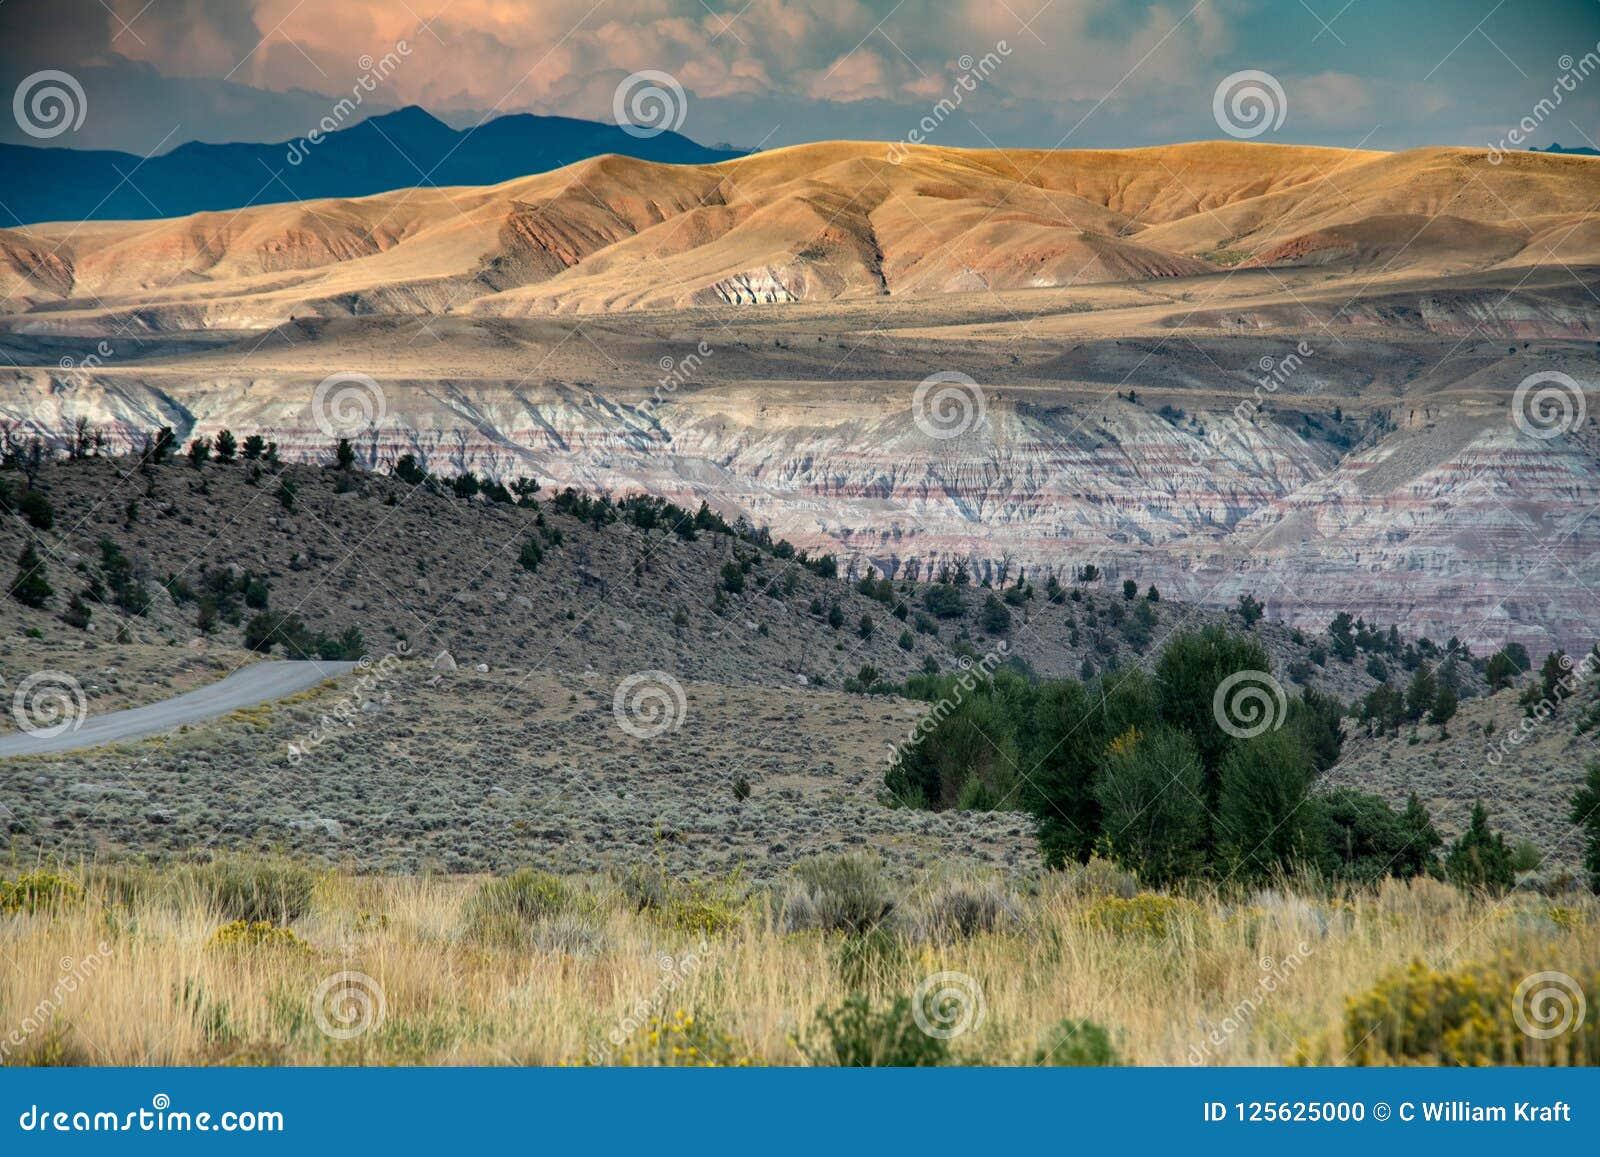 Magnificent Western Lands